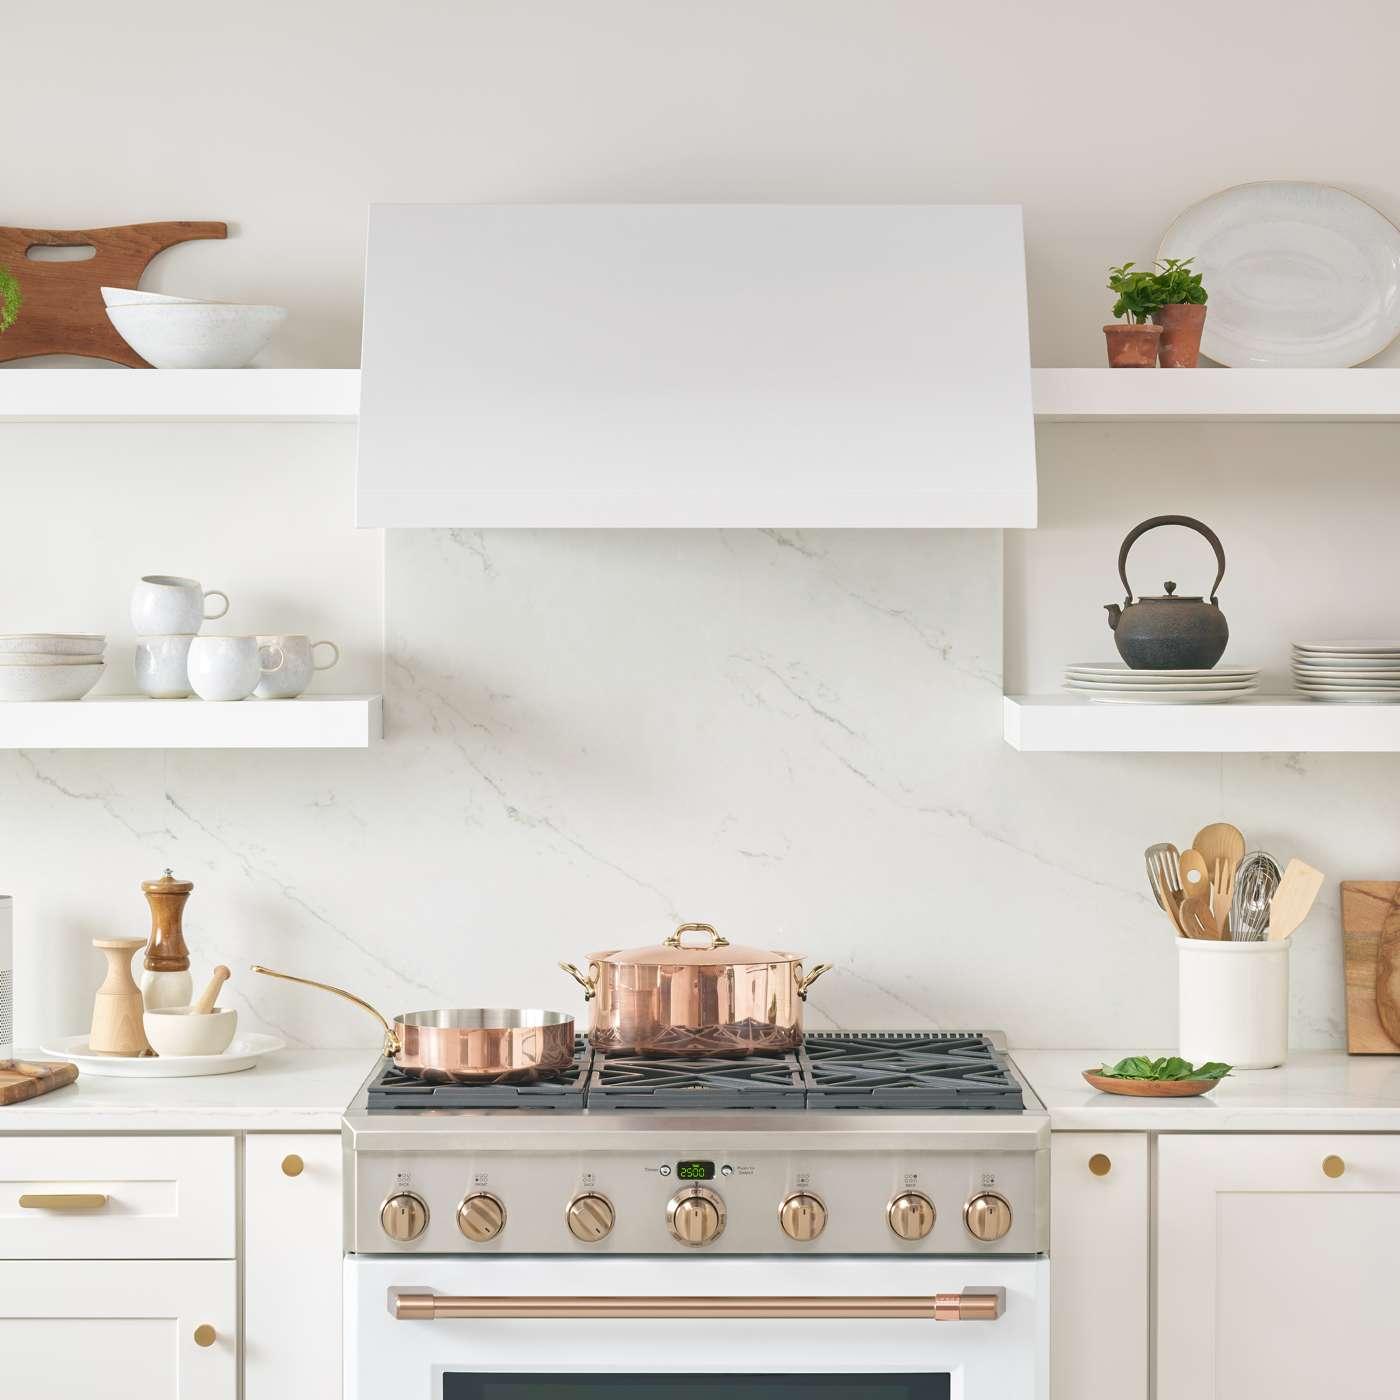 Café, Customizable Kitchen Appliances for the Modern Home